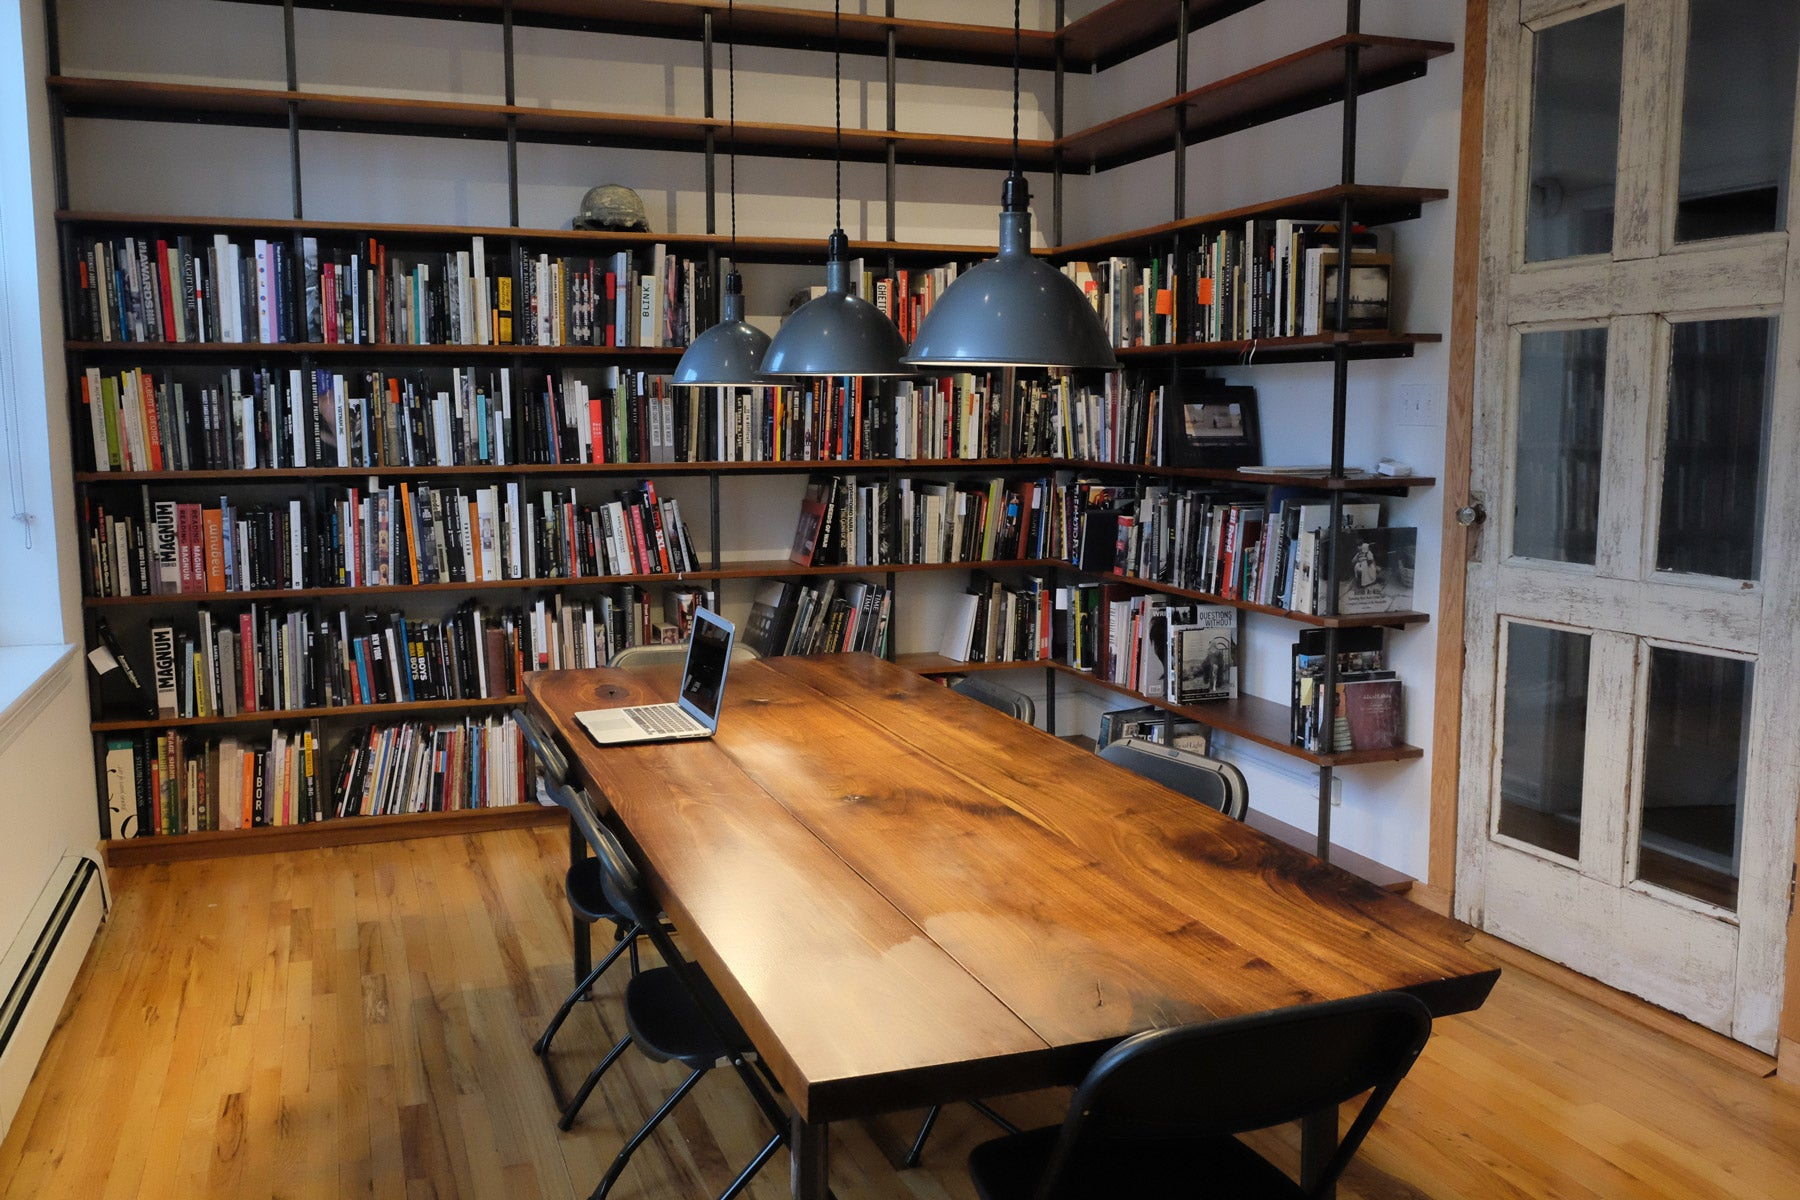 Tim Hetherington Photobook Library Opens at Bronx Documentary Center